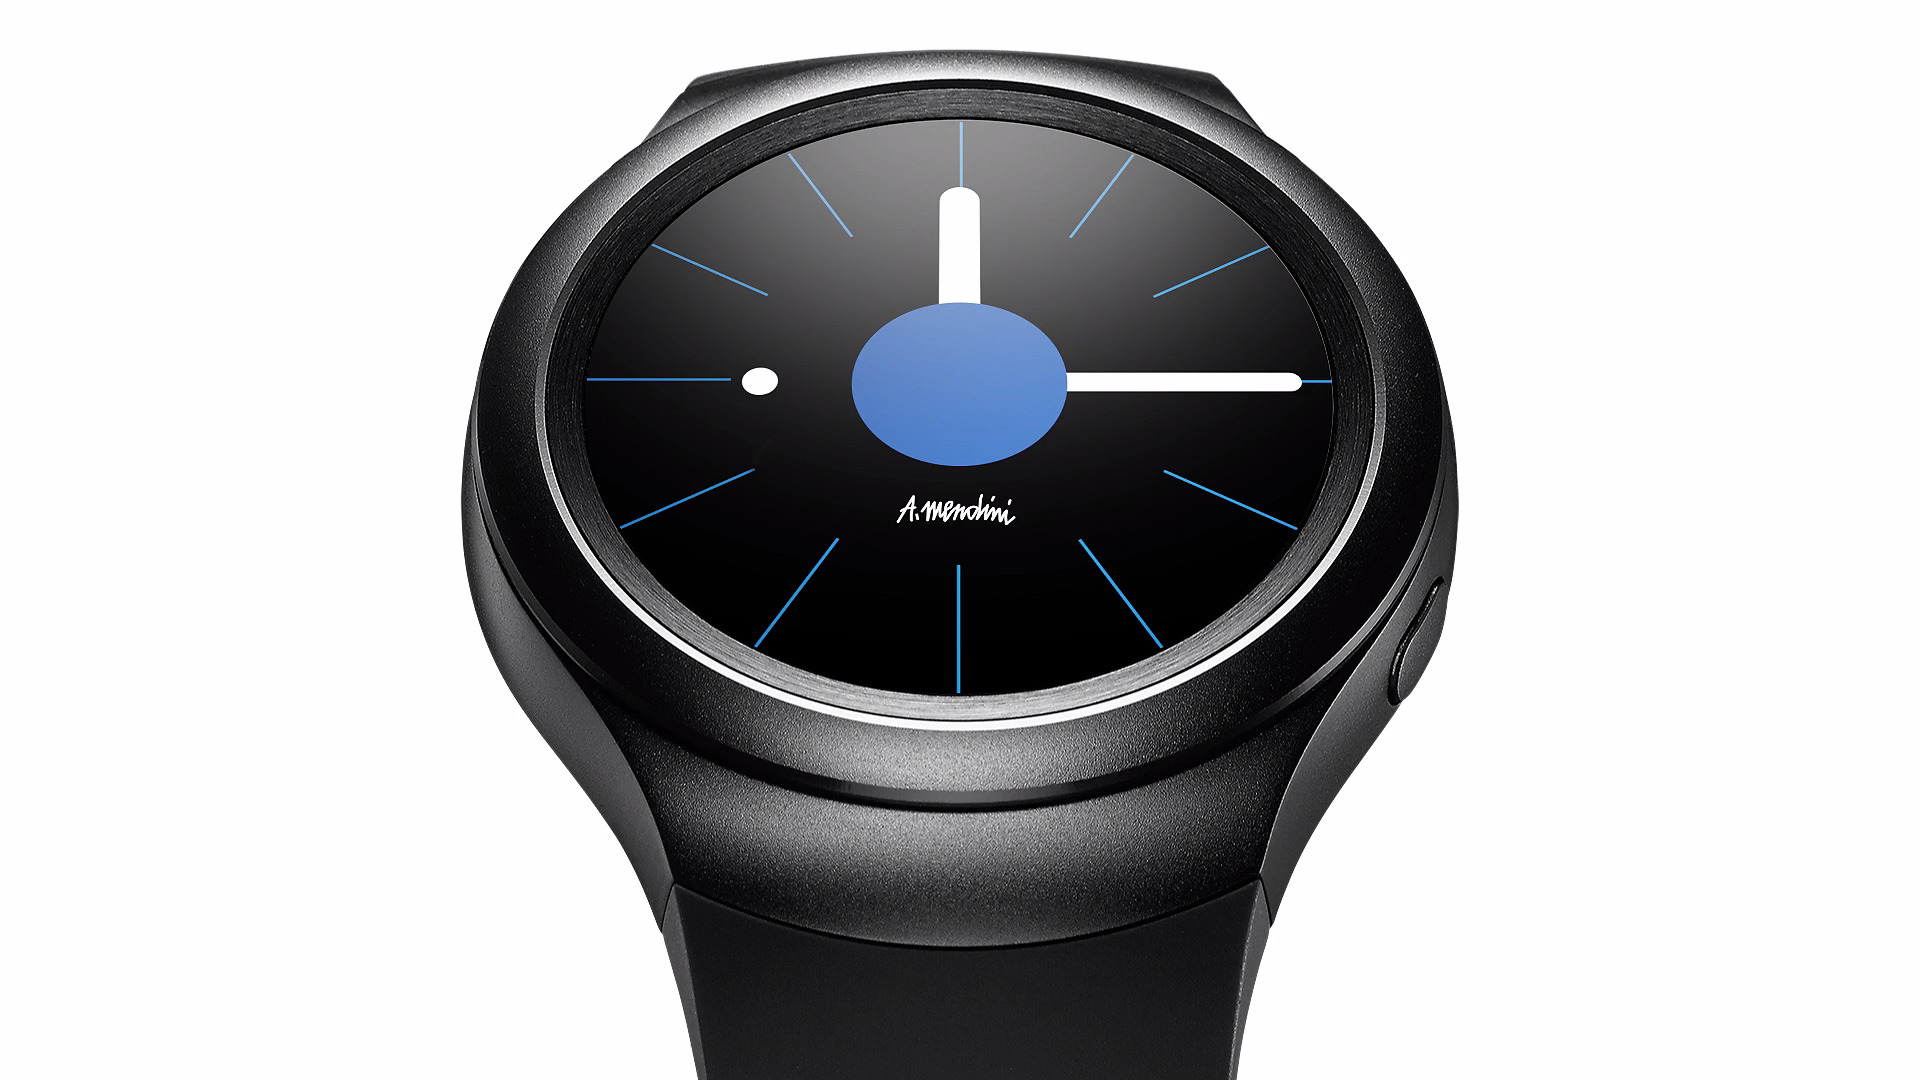 Luxusní kruhový Super AMOLED displej chytrých hodinek Galaxy Gear S2.